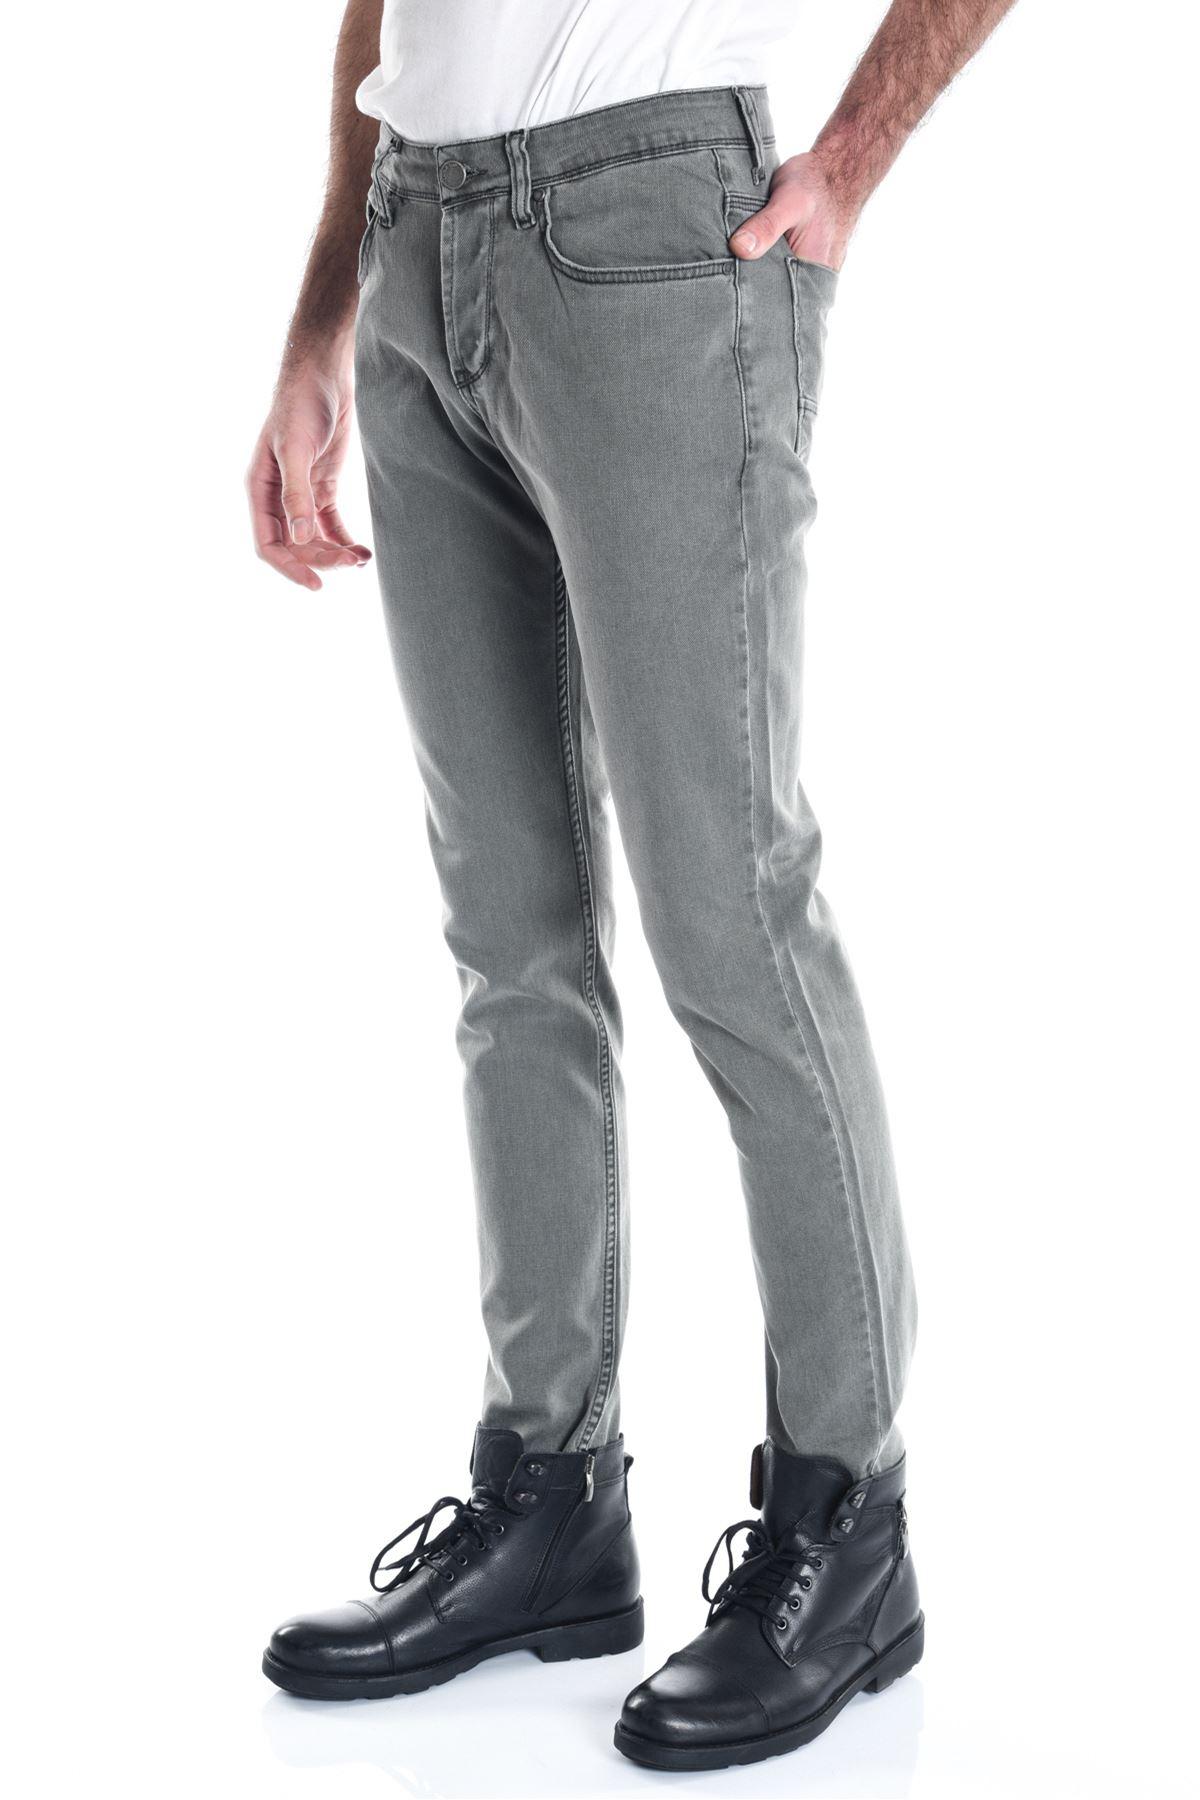 Haki Sade Slimfit Erkek Kot Pantolon